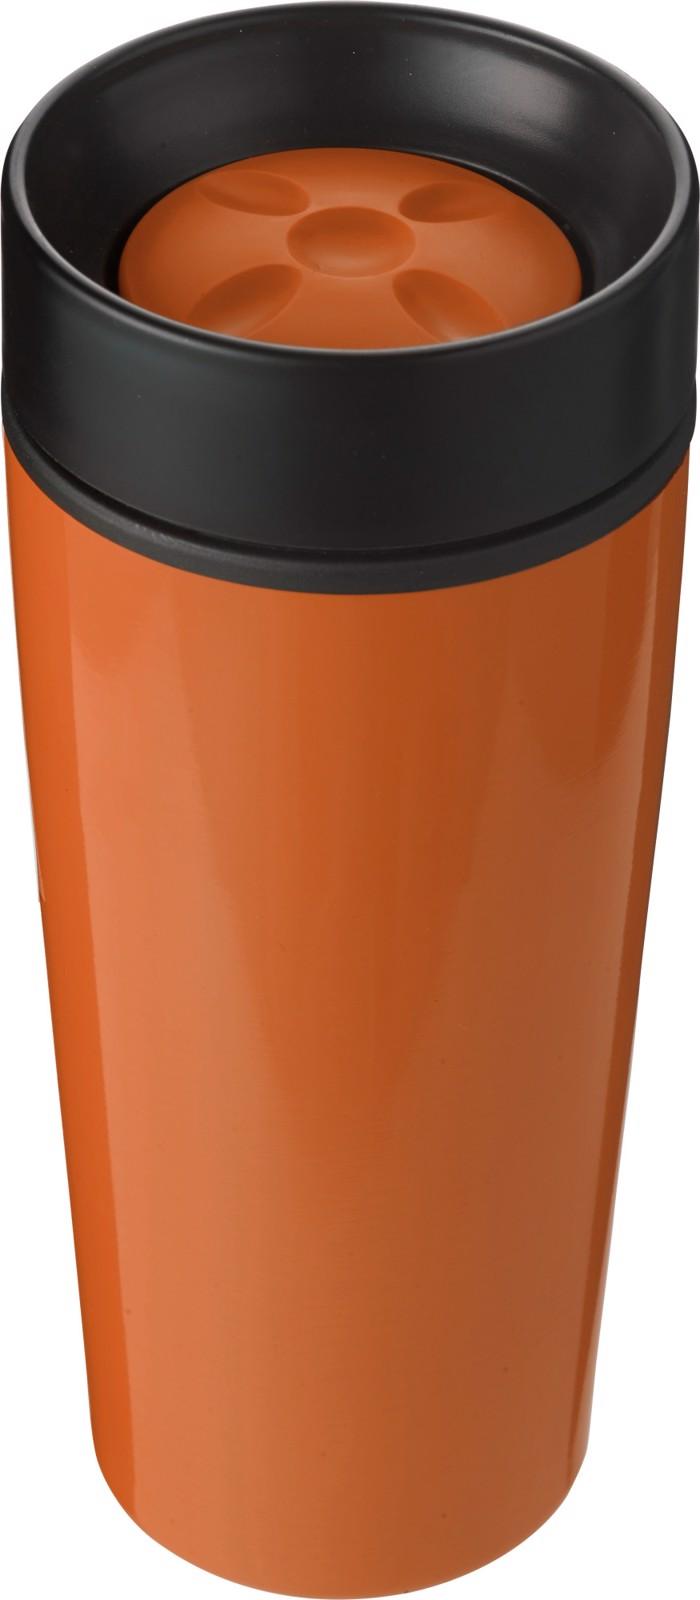 Stainless steel double walled travel mug - Orange